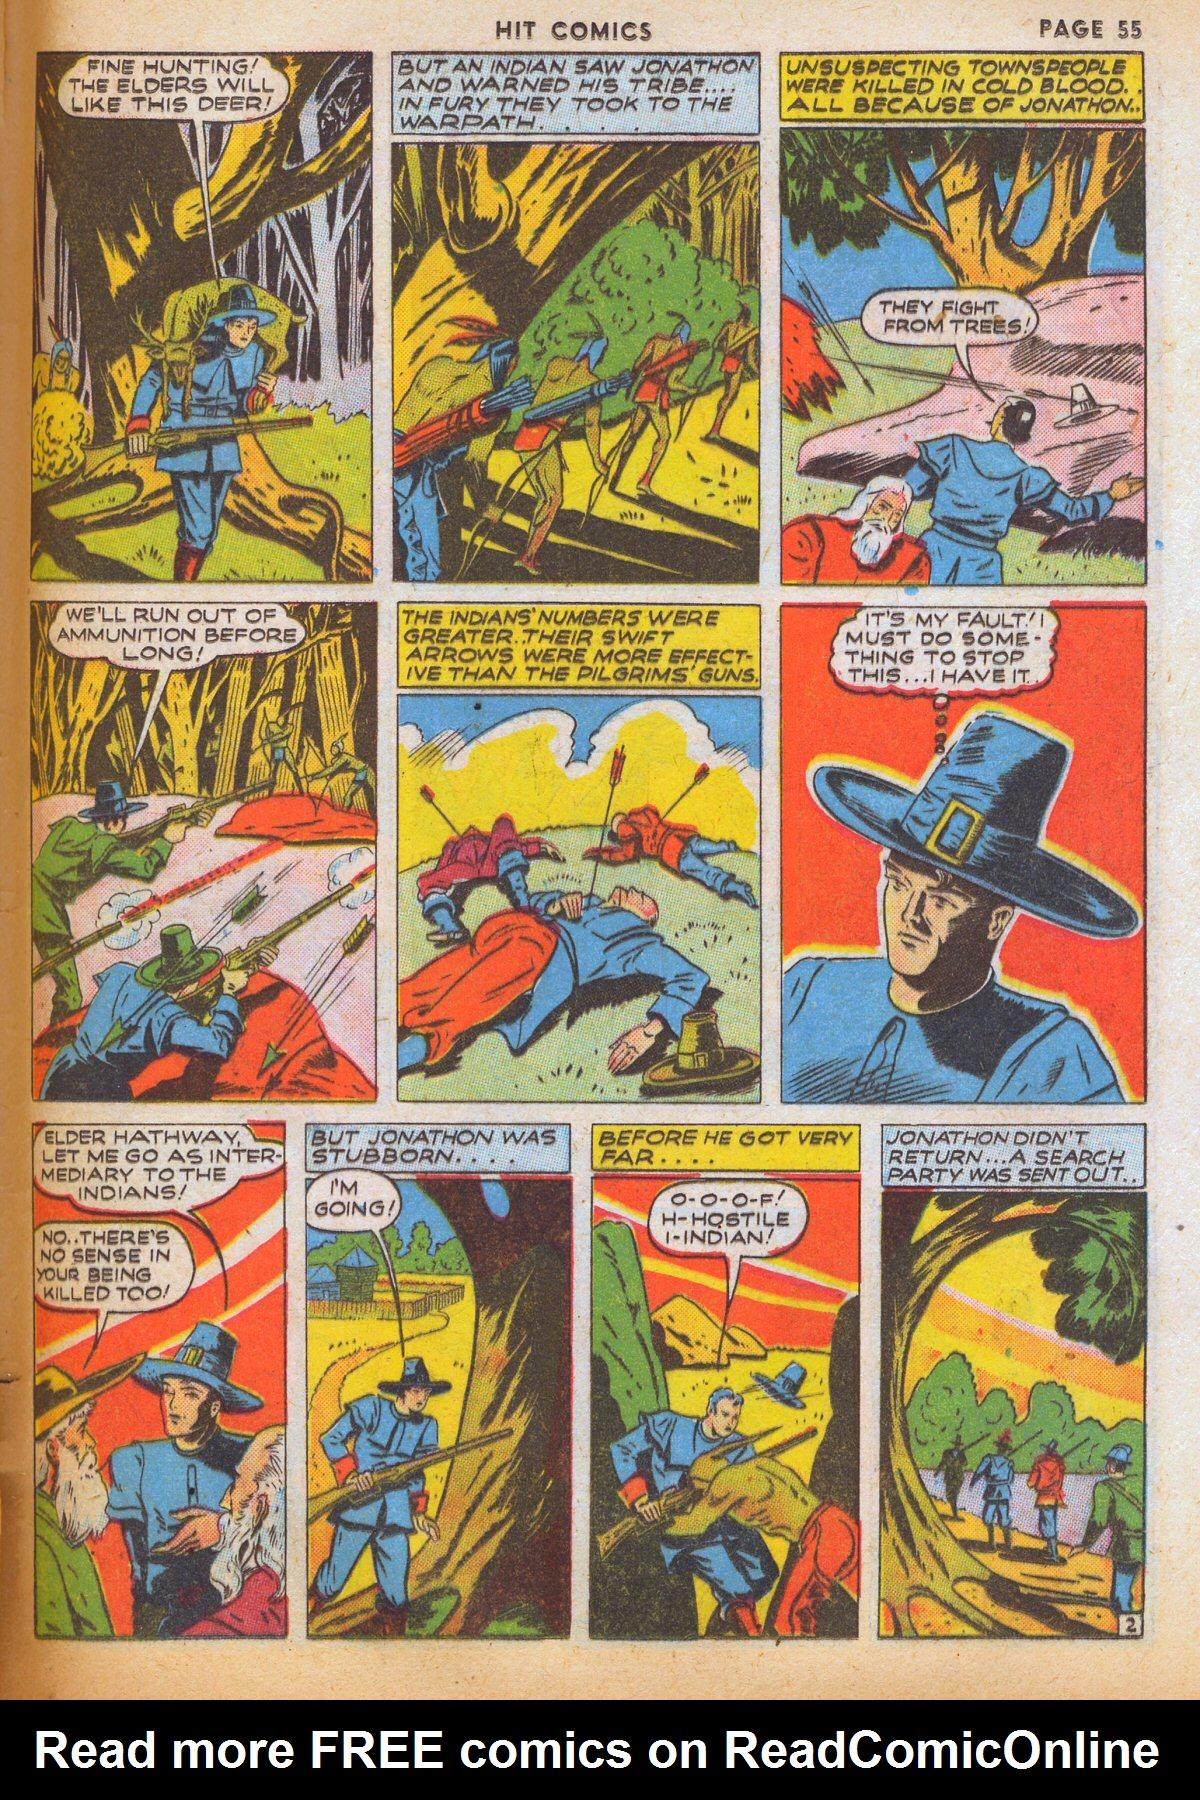 Read online Hit Comics comic -  Issue #12 - 57